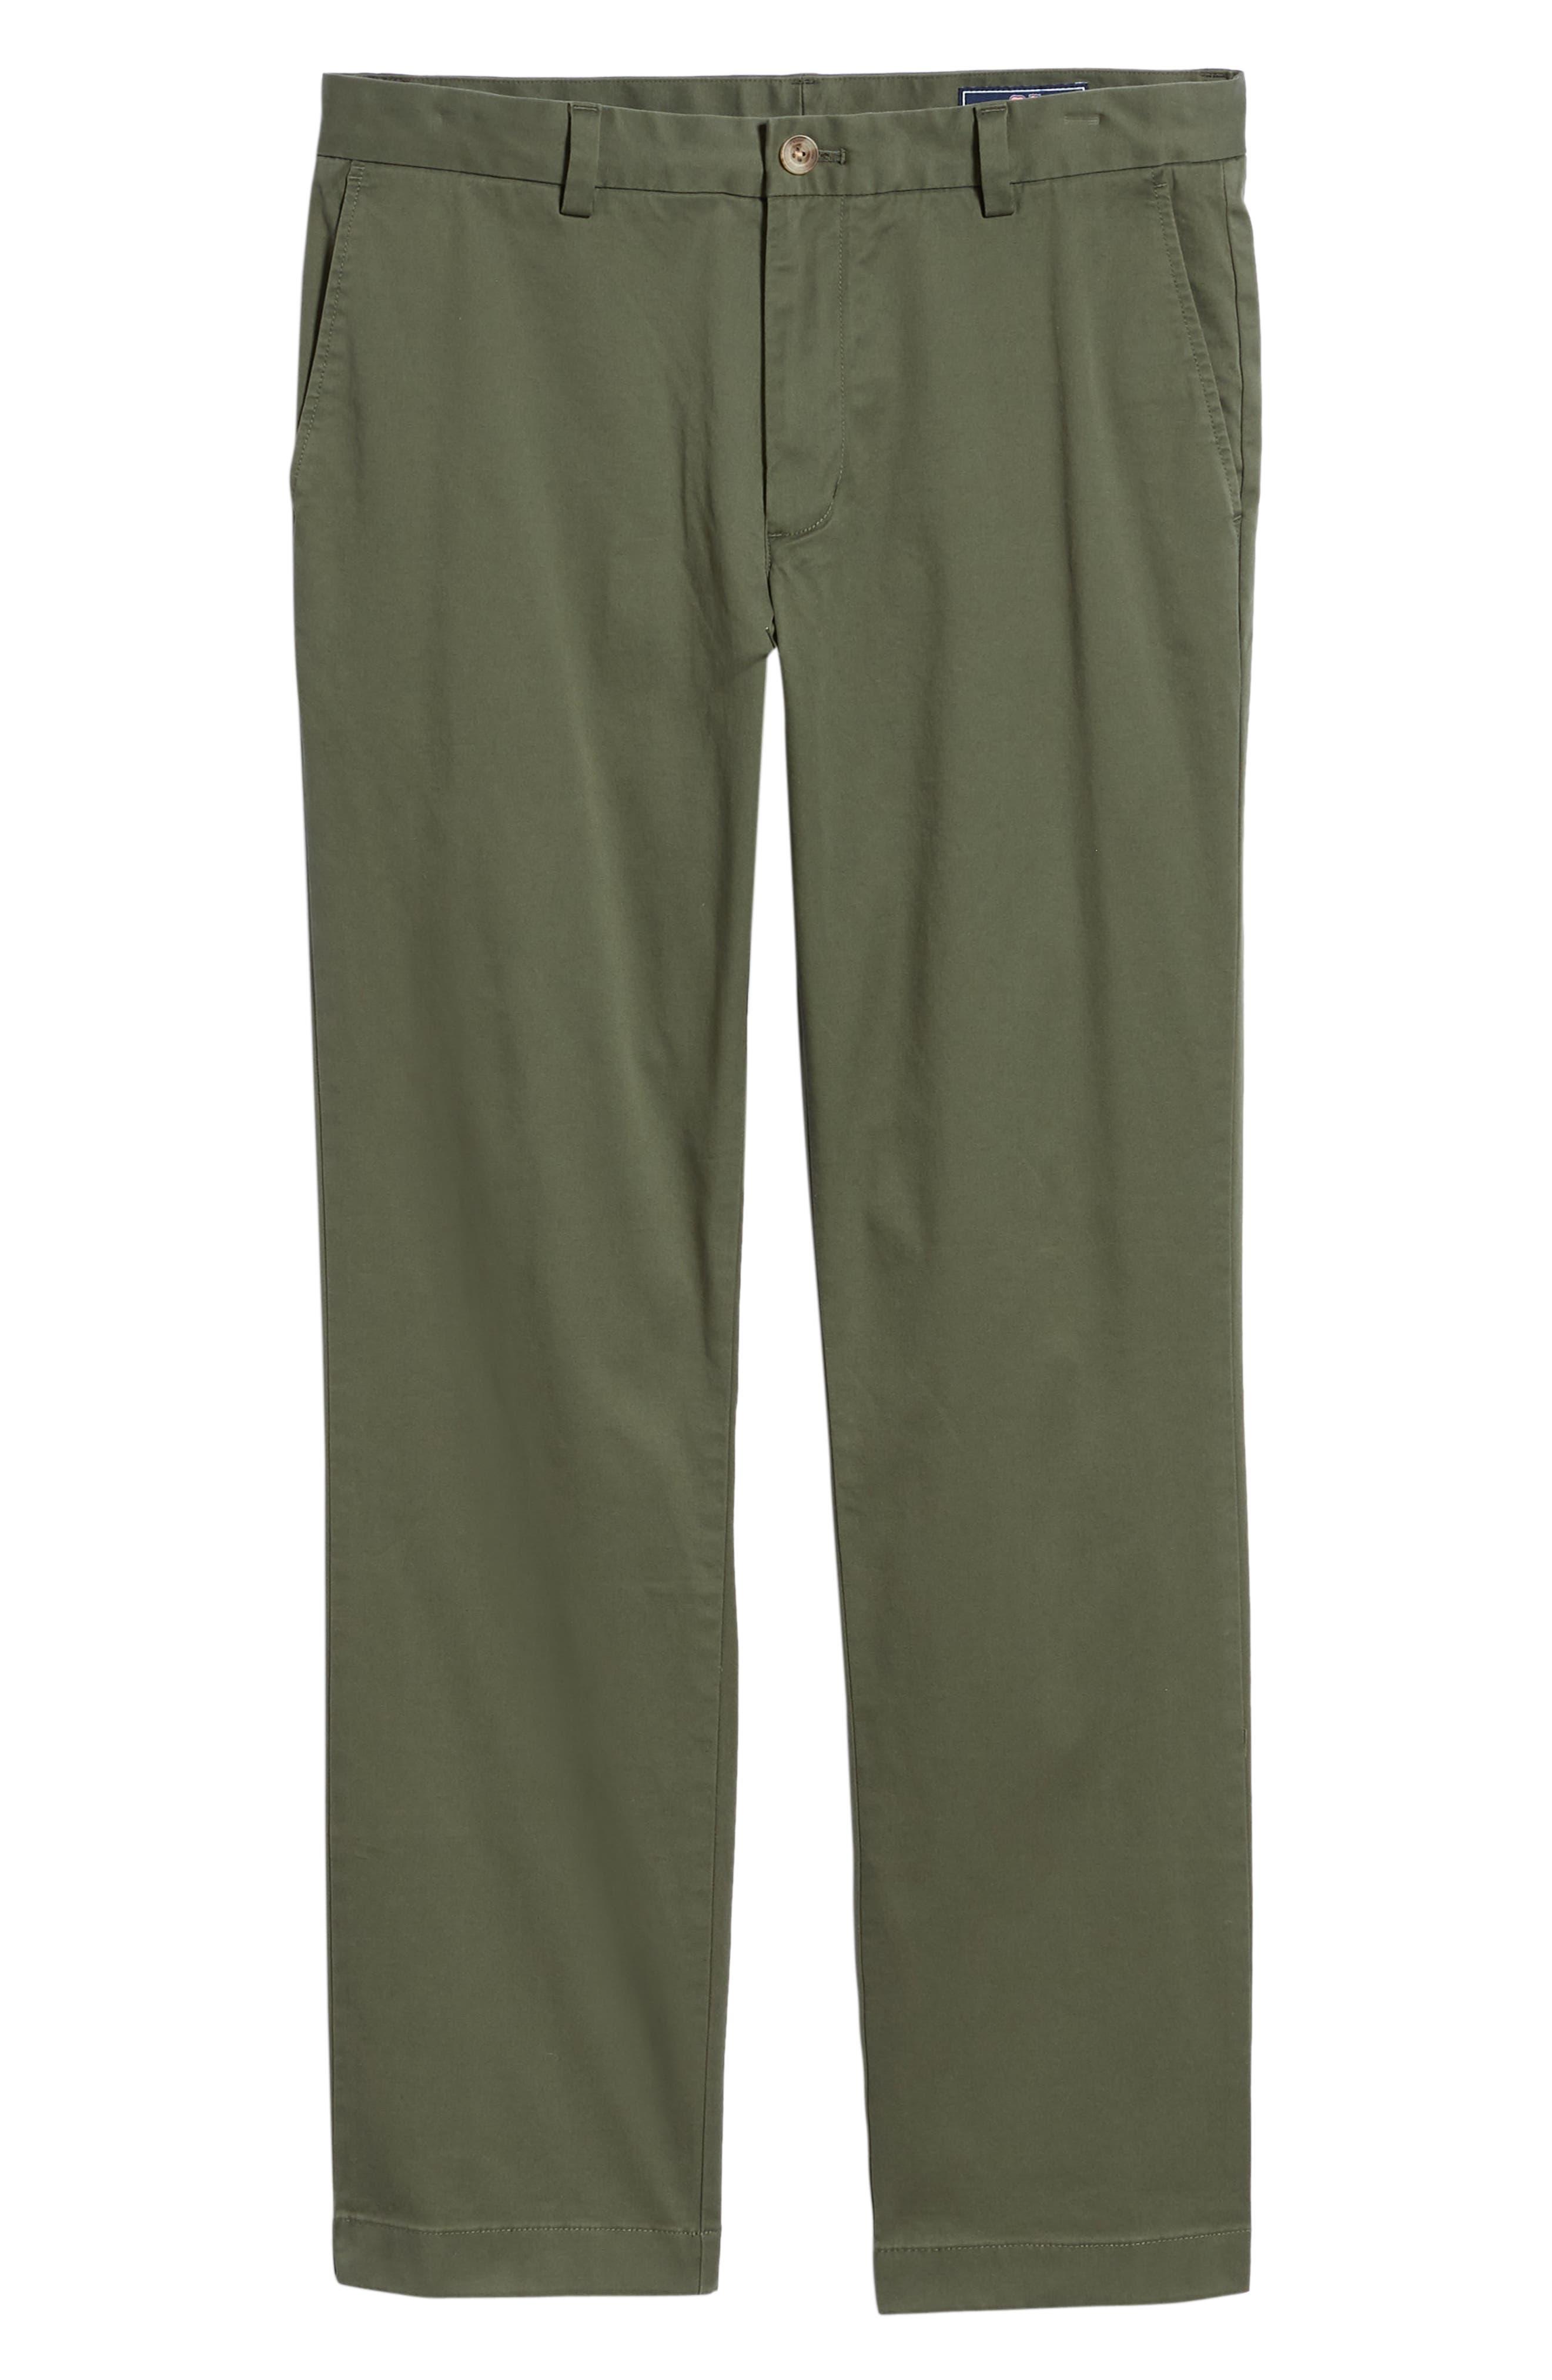 VINEYARD VINES, Breaker Flat Front Stretch Cotton Pants, Alternate thumbnail 7, color, CARGO GREEN